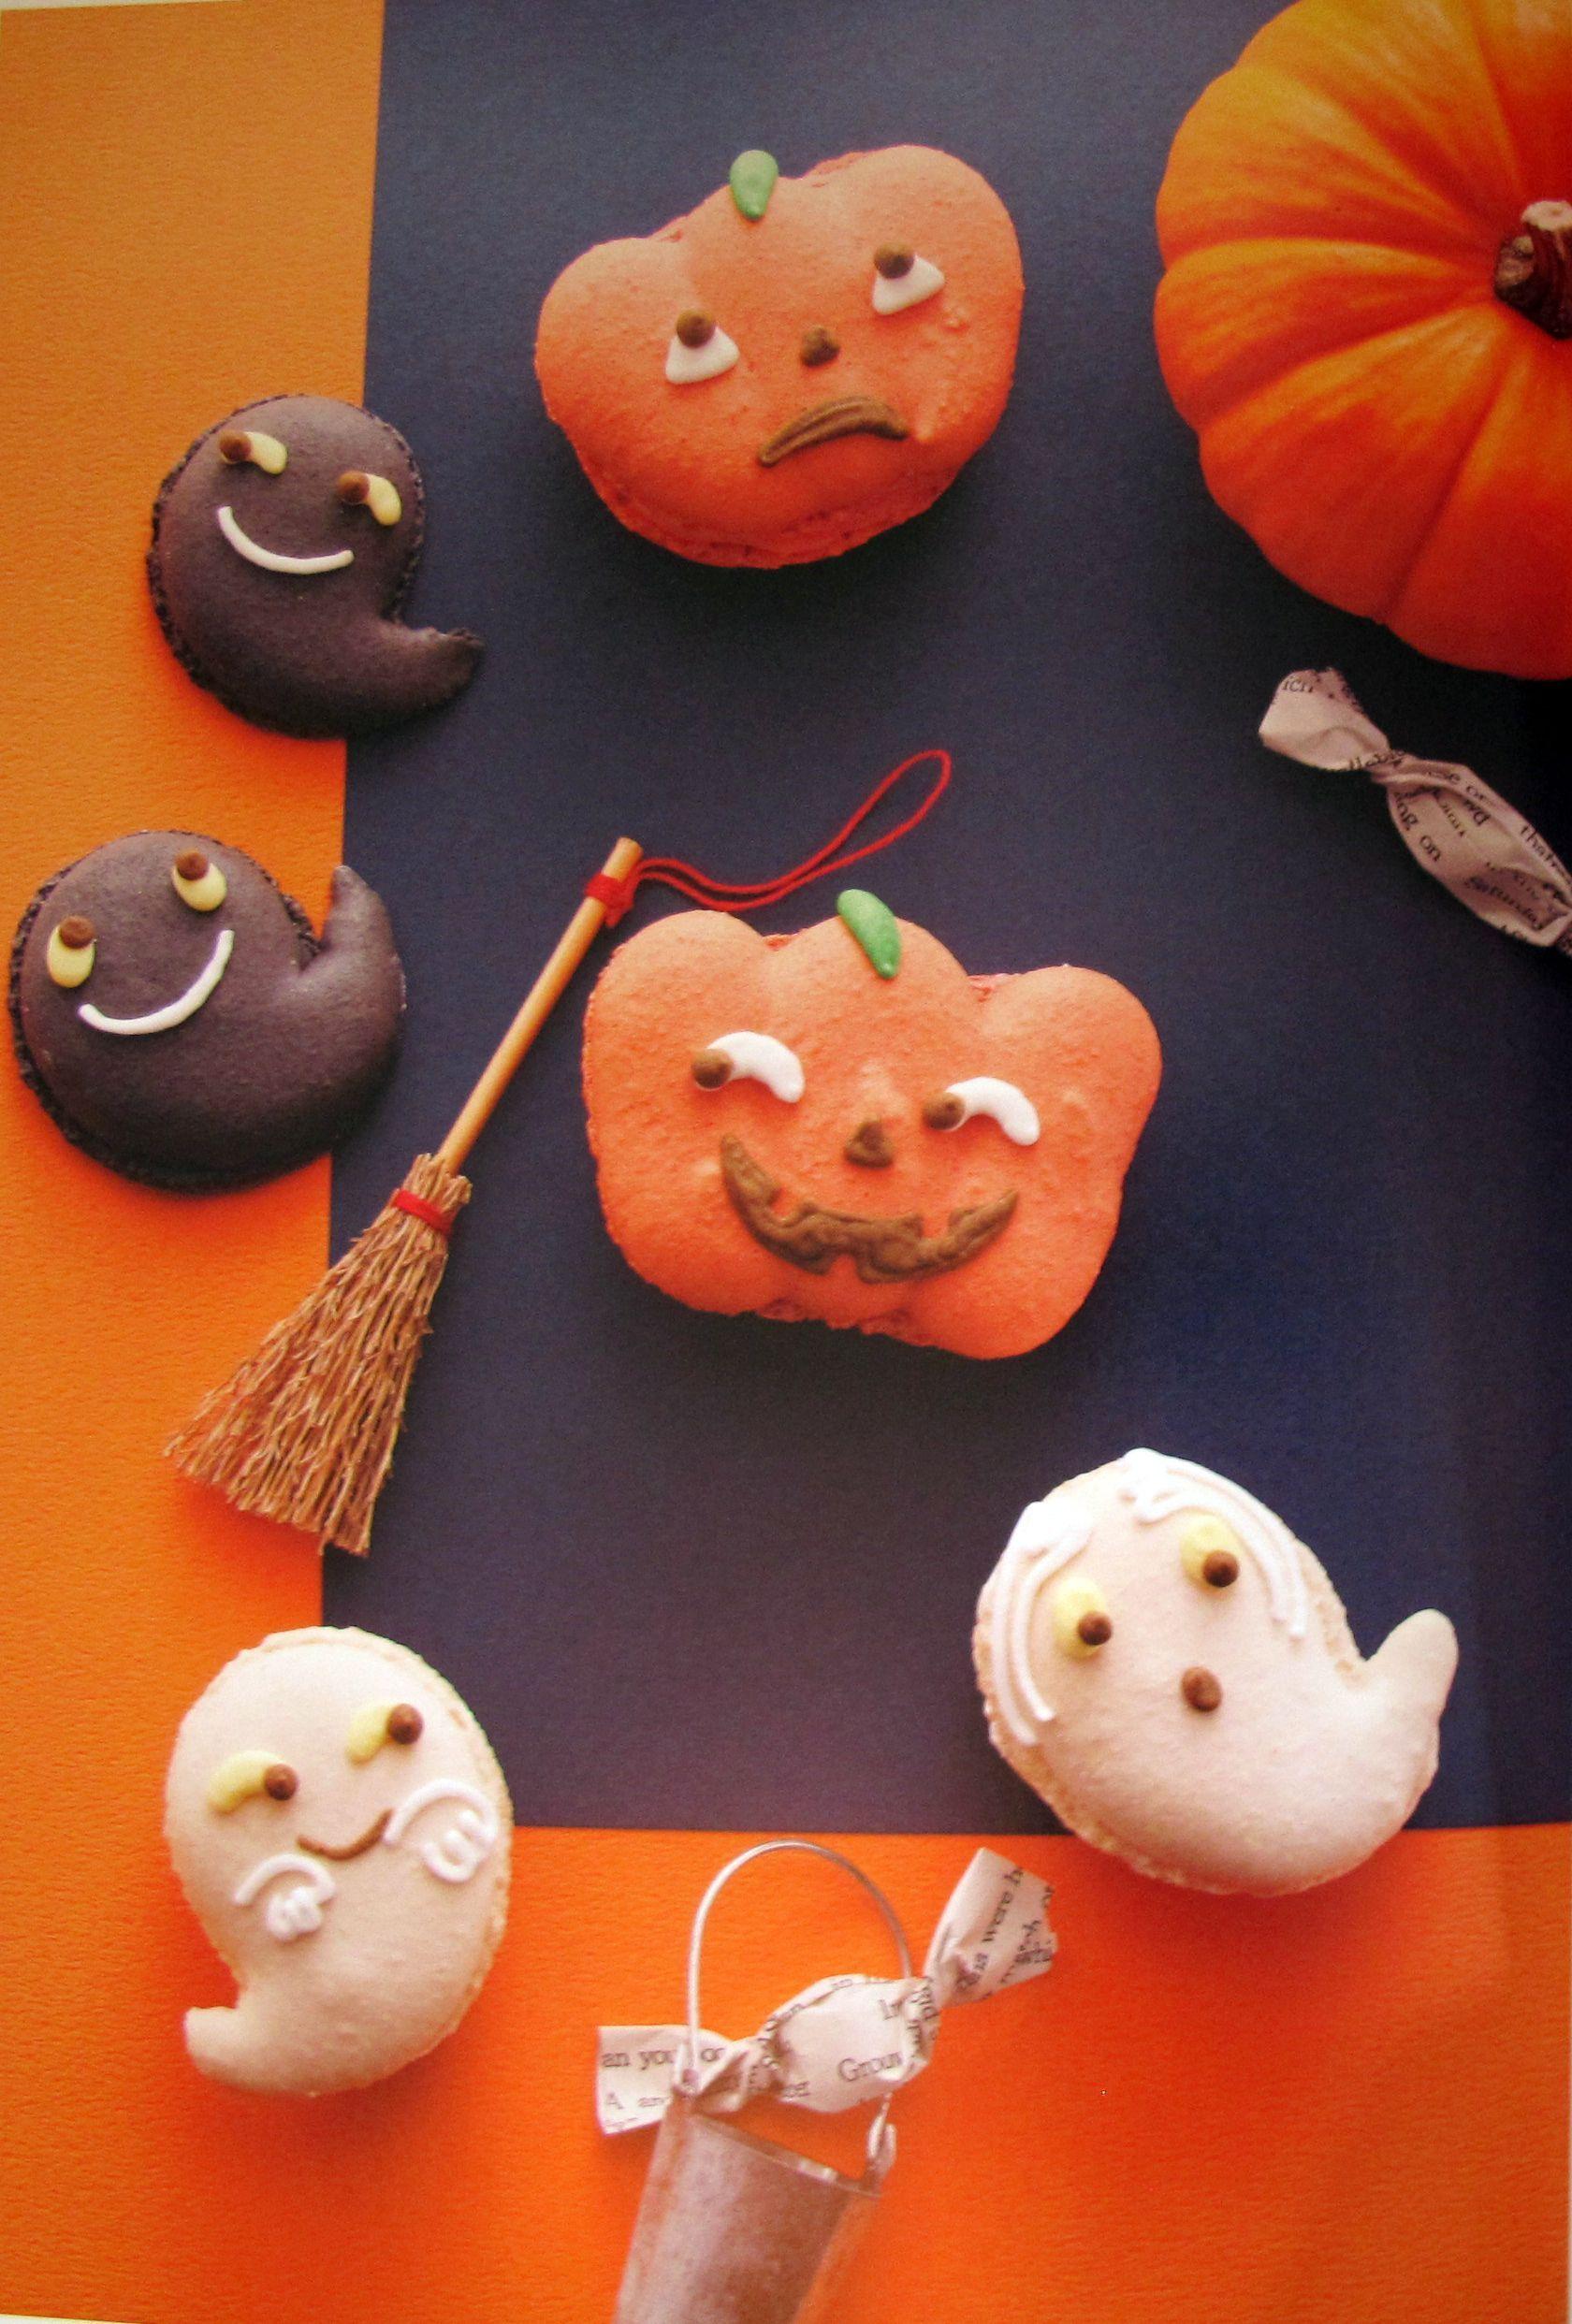 Halloween Macaron #halloweenmacarons Halloween Macaron #halloweenmacarons Halloween Macaron #halloweenmacarons Halloween Macaron #halloweenmacarons